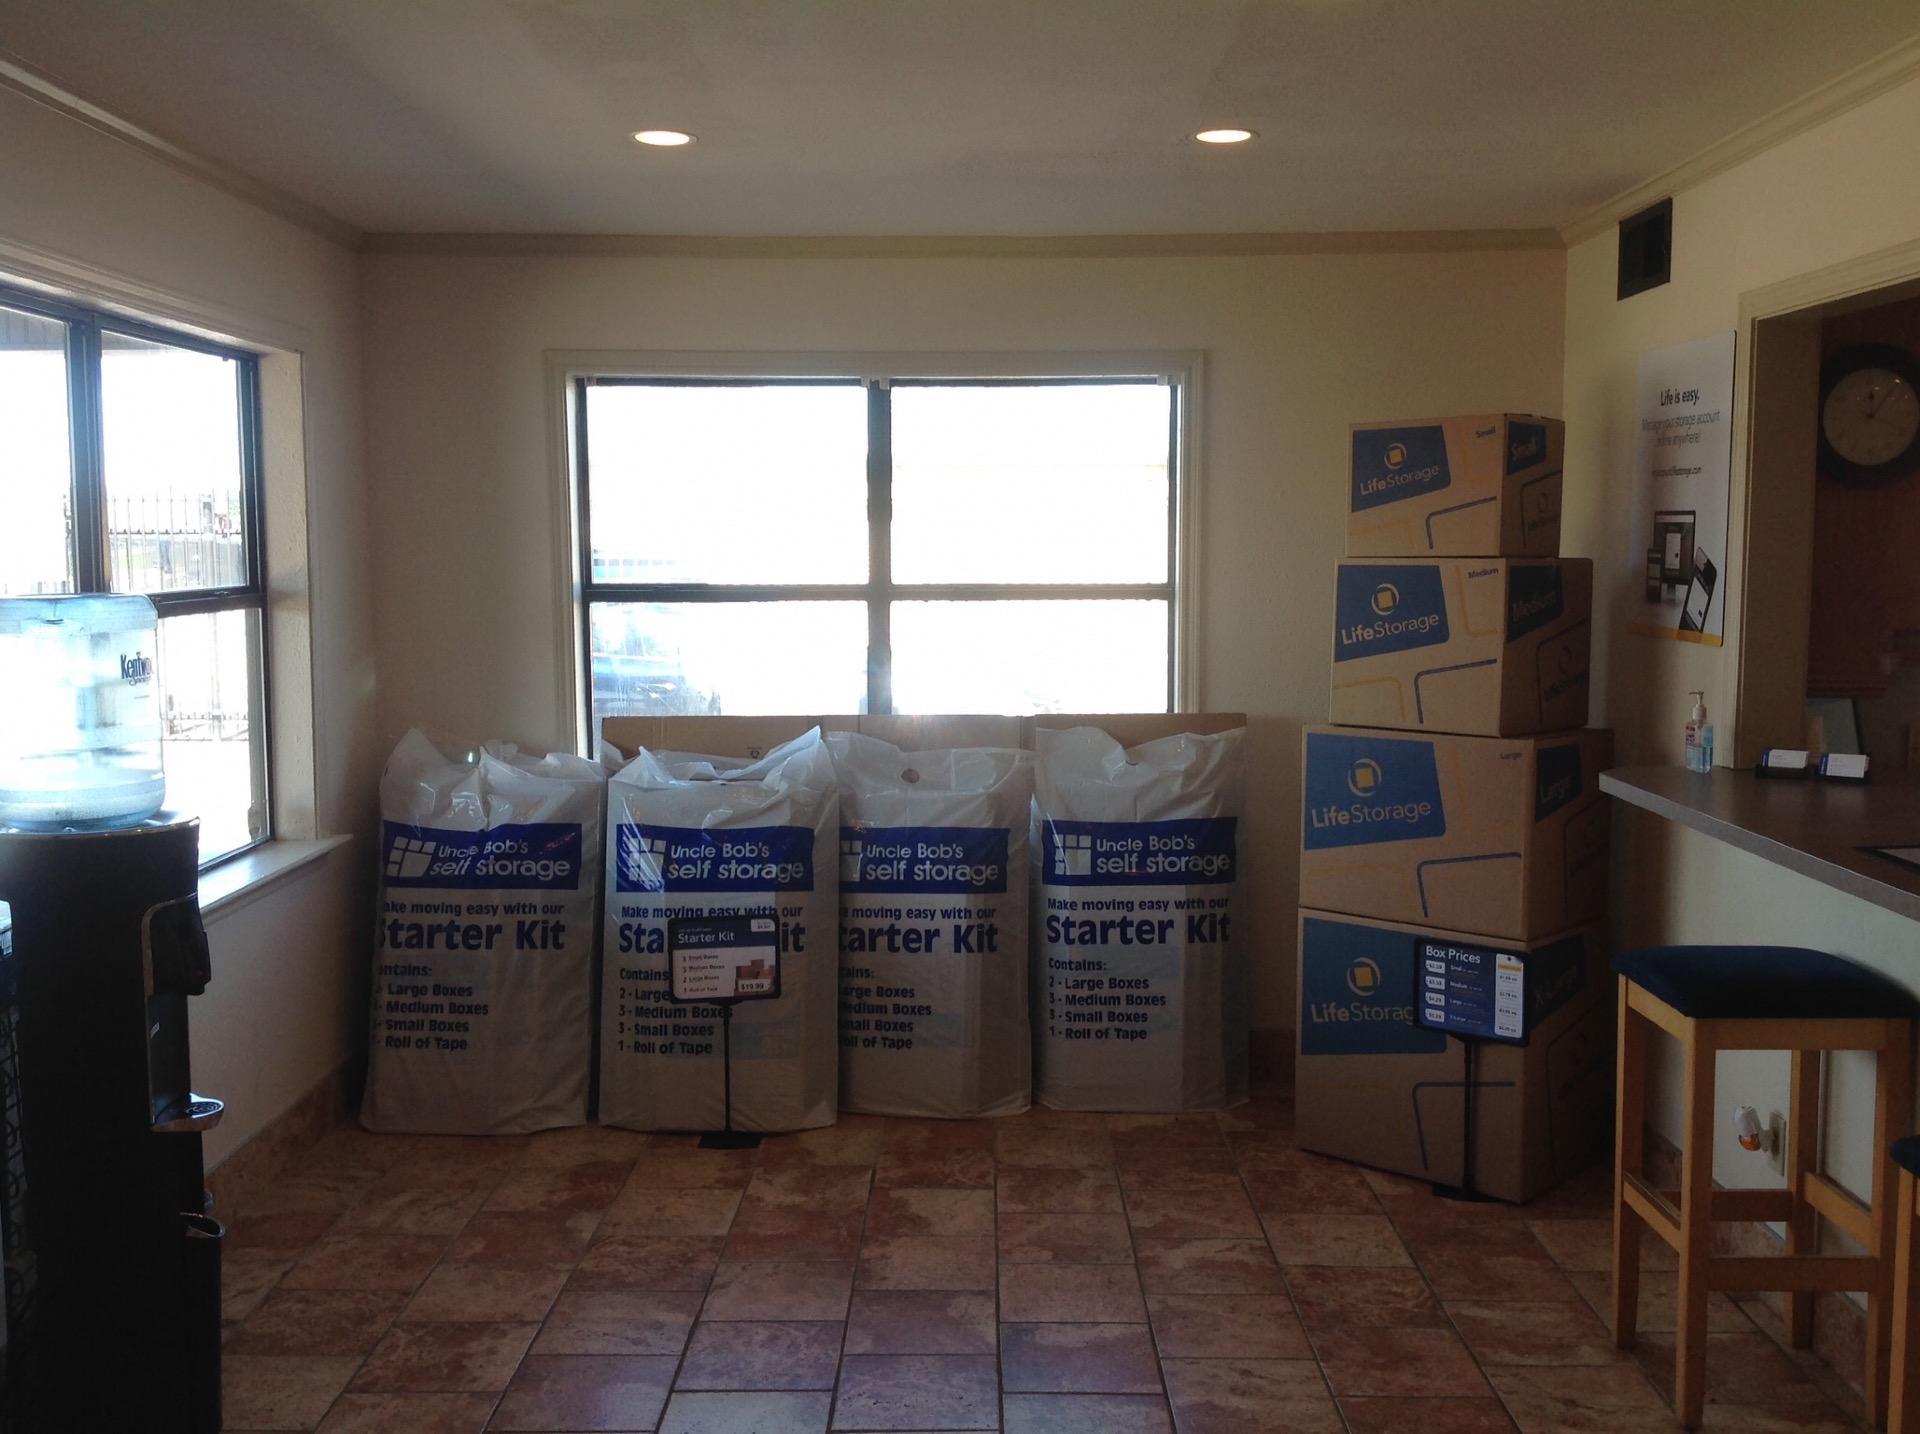 Life Storage near Mouton, Lafayette LA   Rent Storage Units (324)